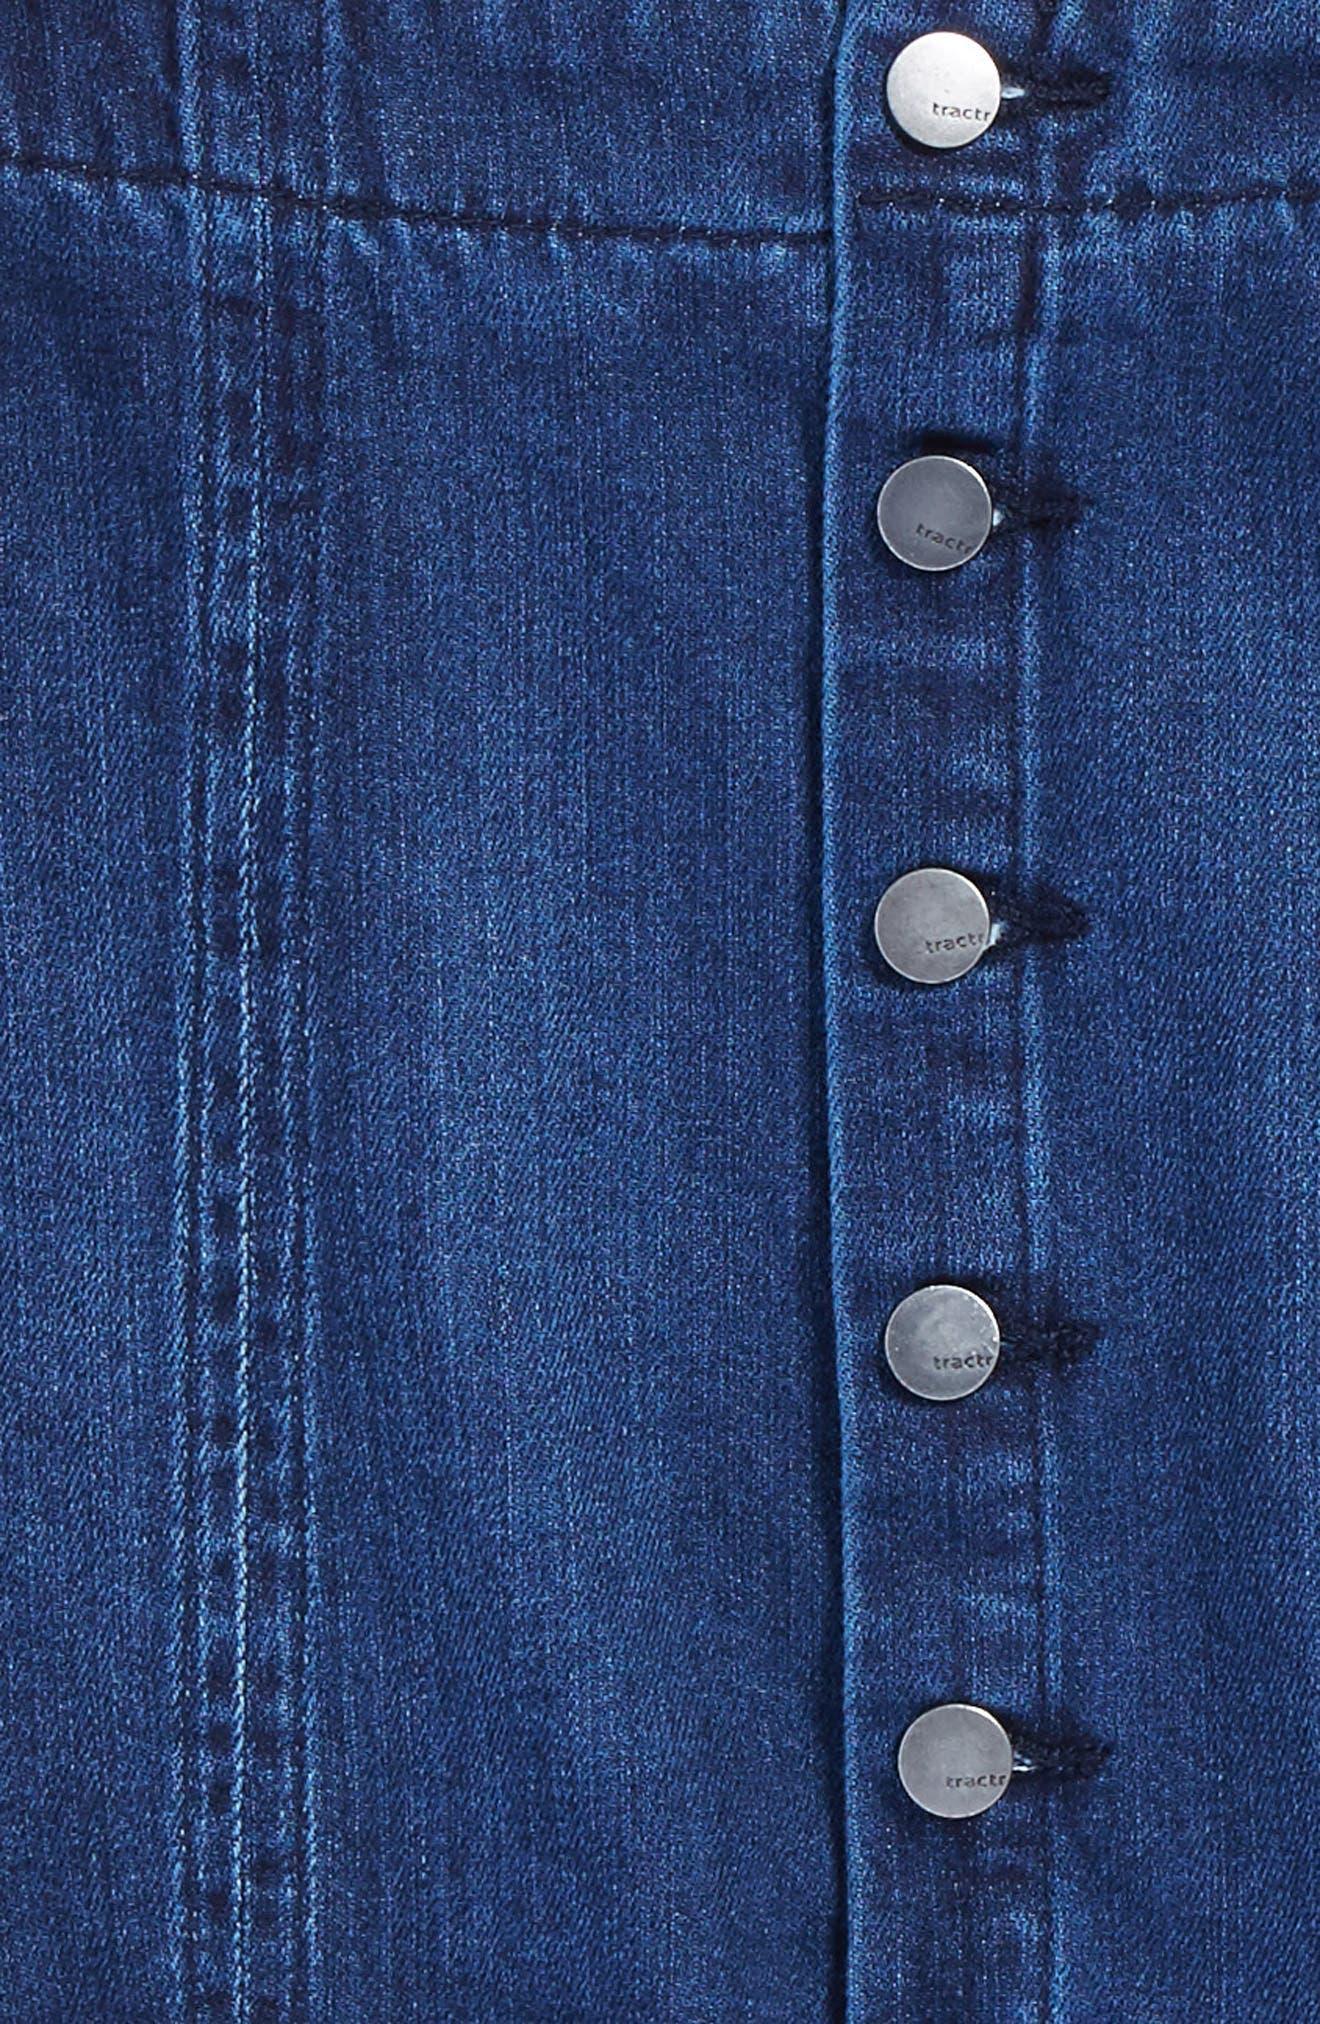 Frayed Scallop Denim Skirt,                             Alternate thumbnail 3, color,                             Indigo